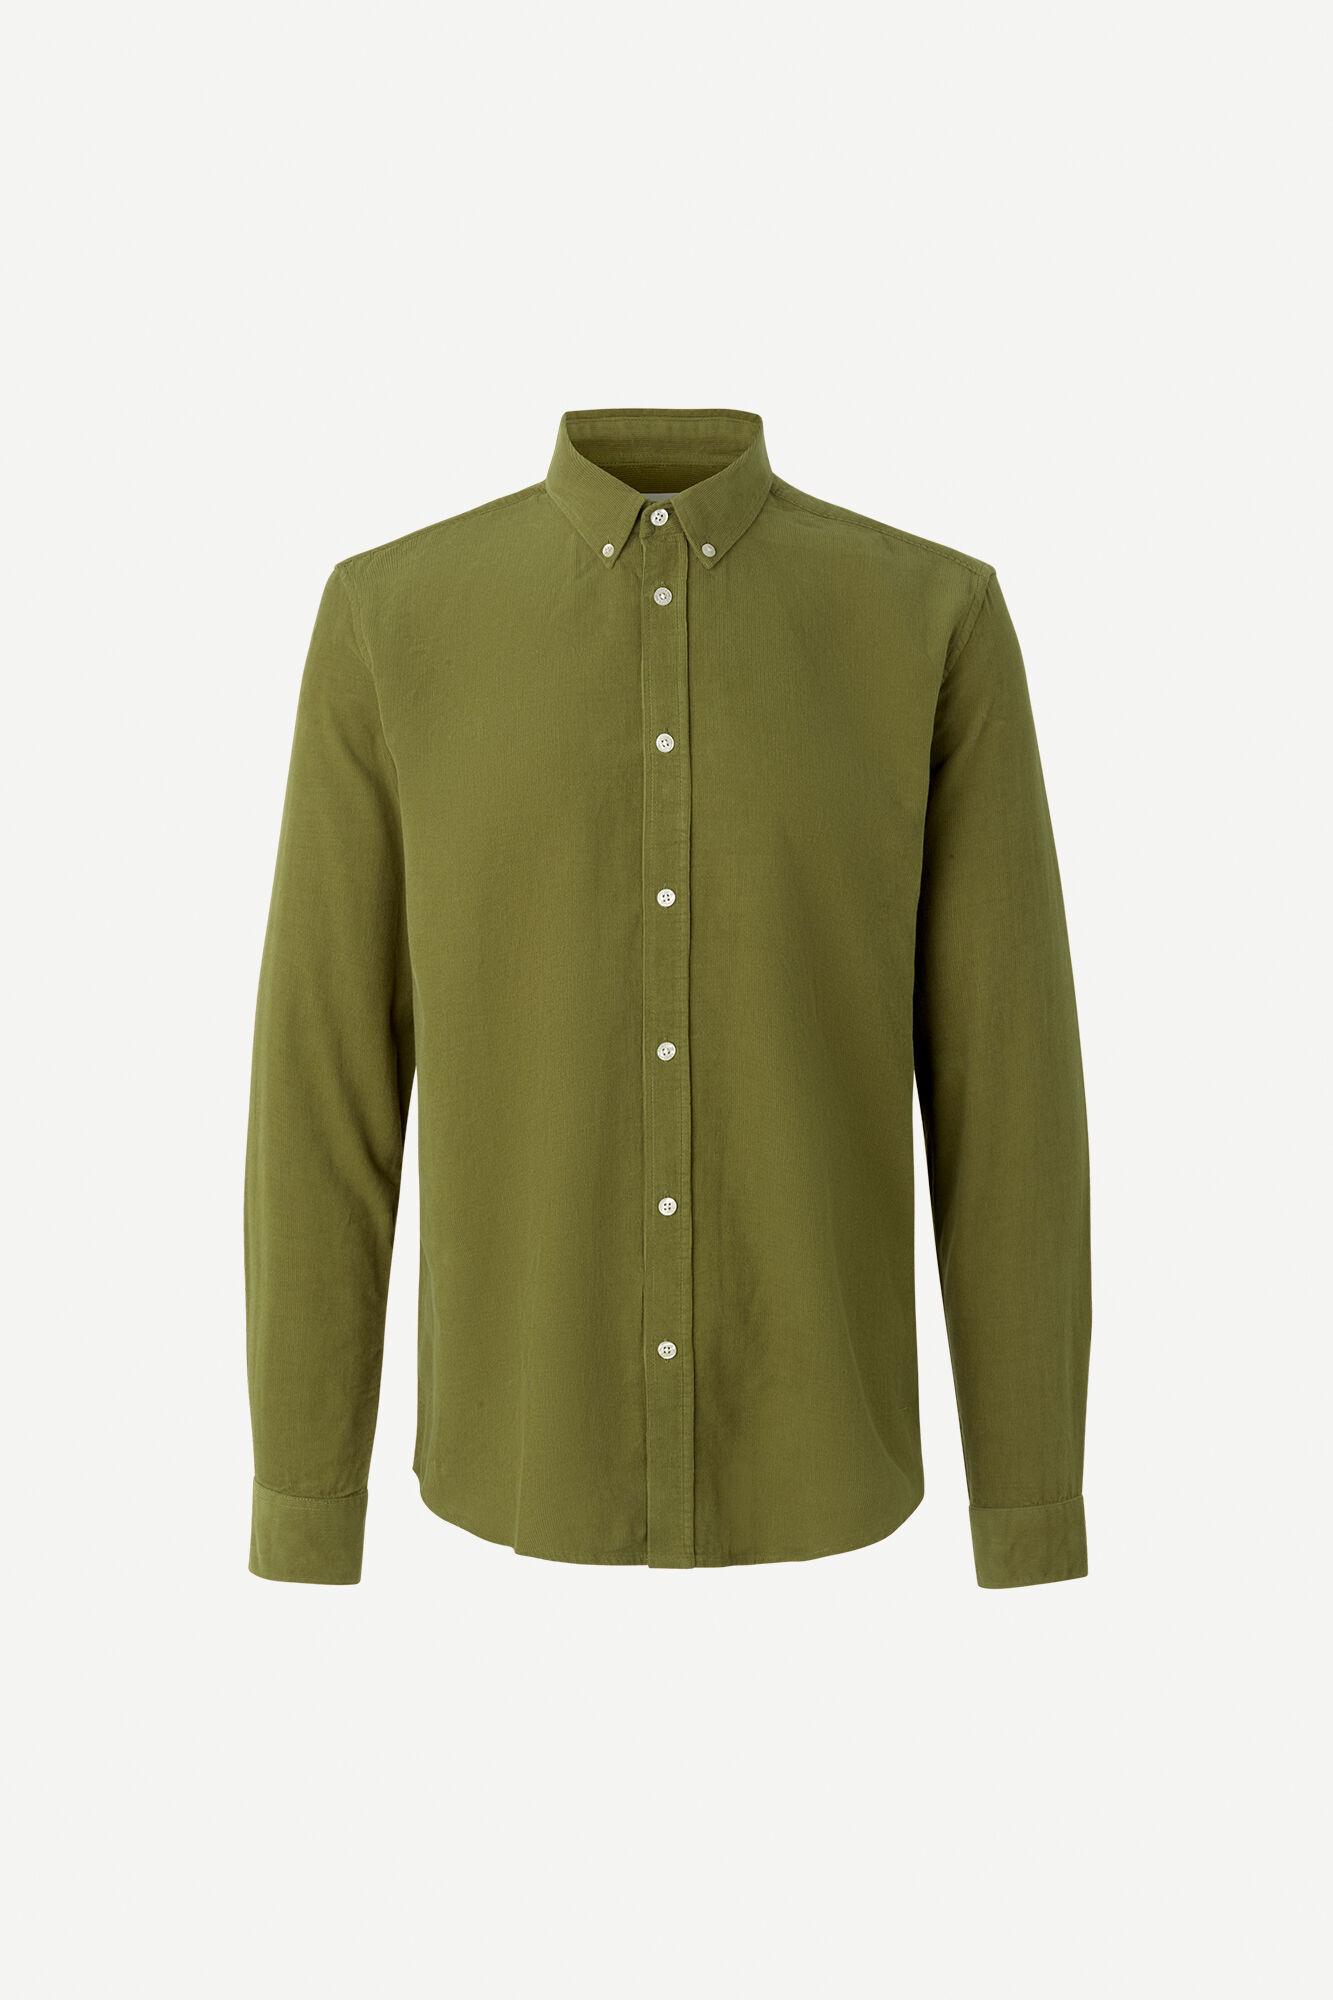 Liam BX Shirt Capulet Olive Green Corduroy-1